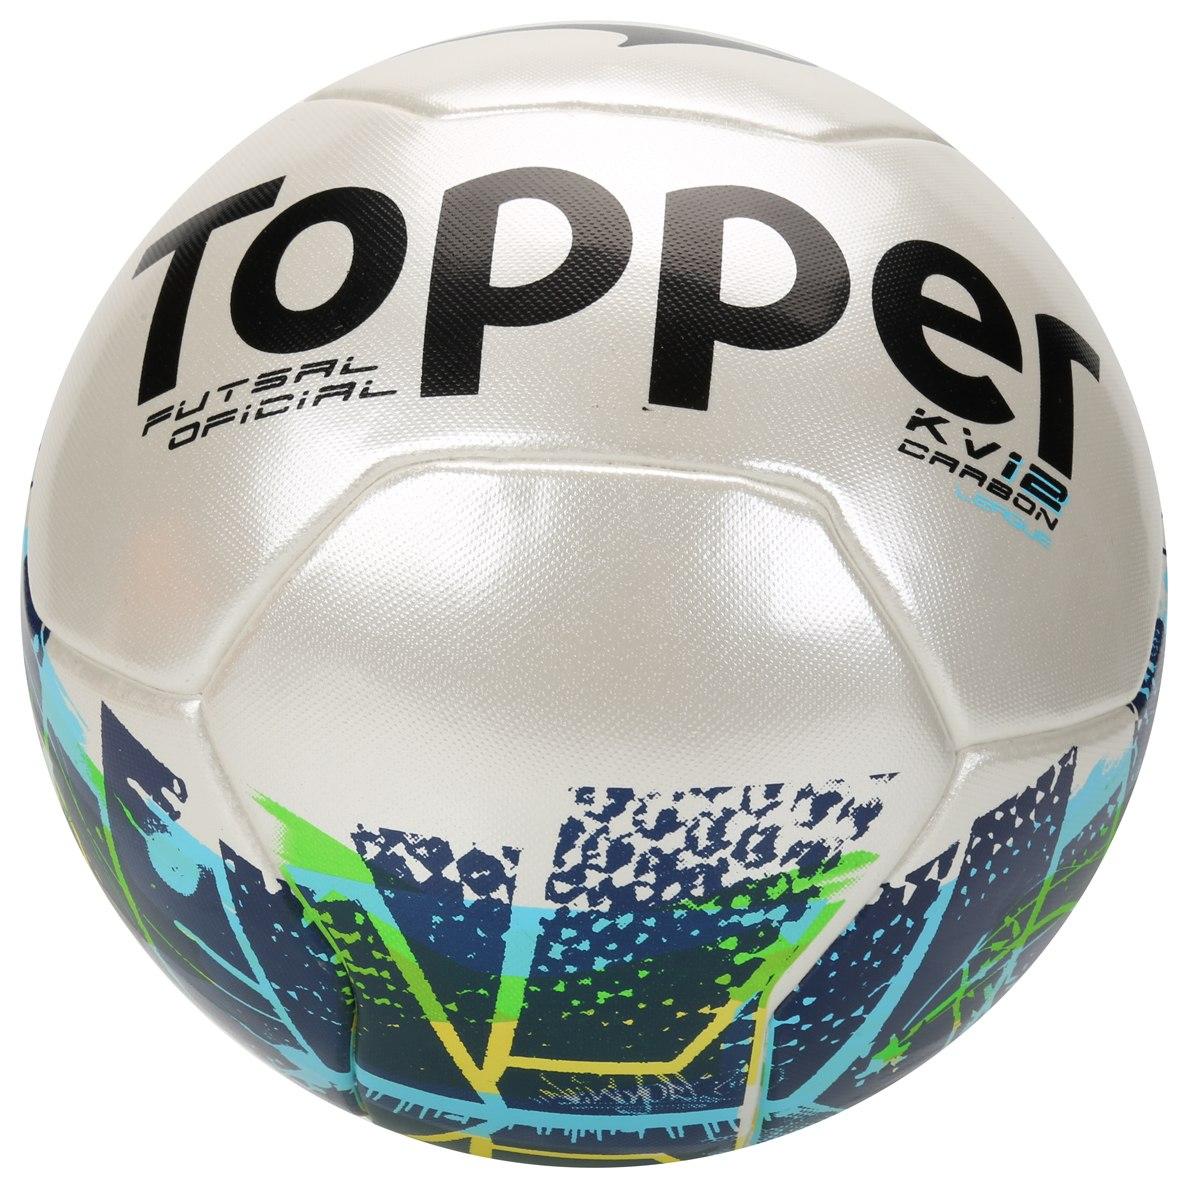 31d8456050 Bola Futsal Topper Kv Carbon League 2 - R  199